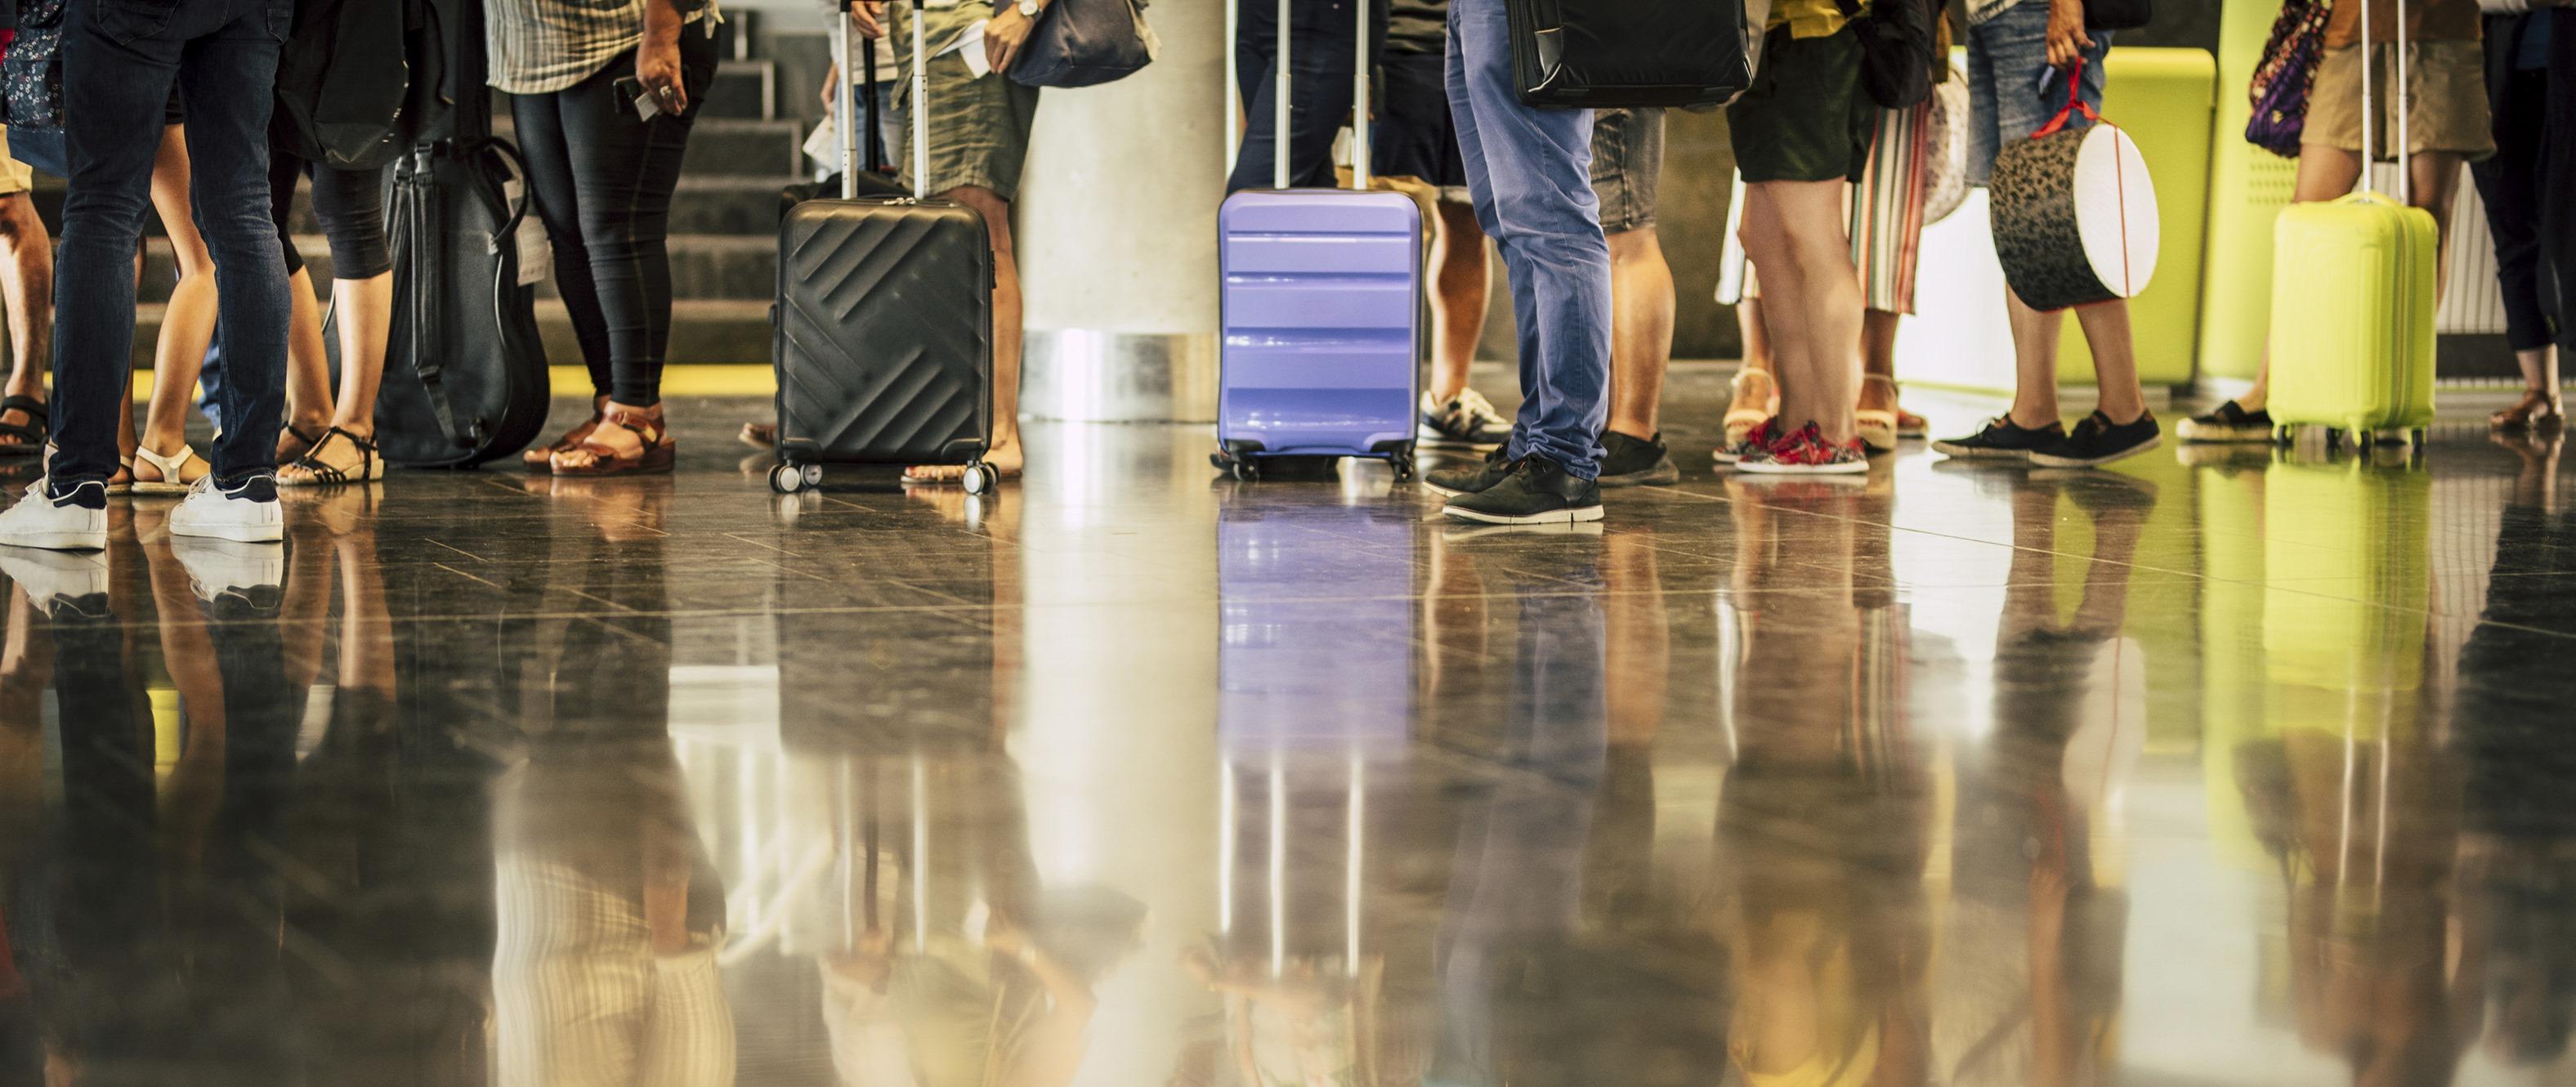 Preventative Health Tips for Travelers